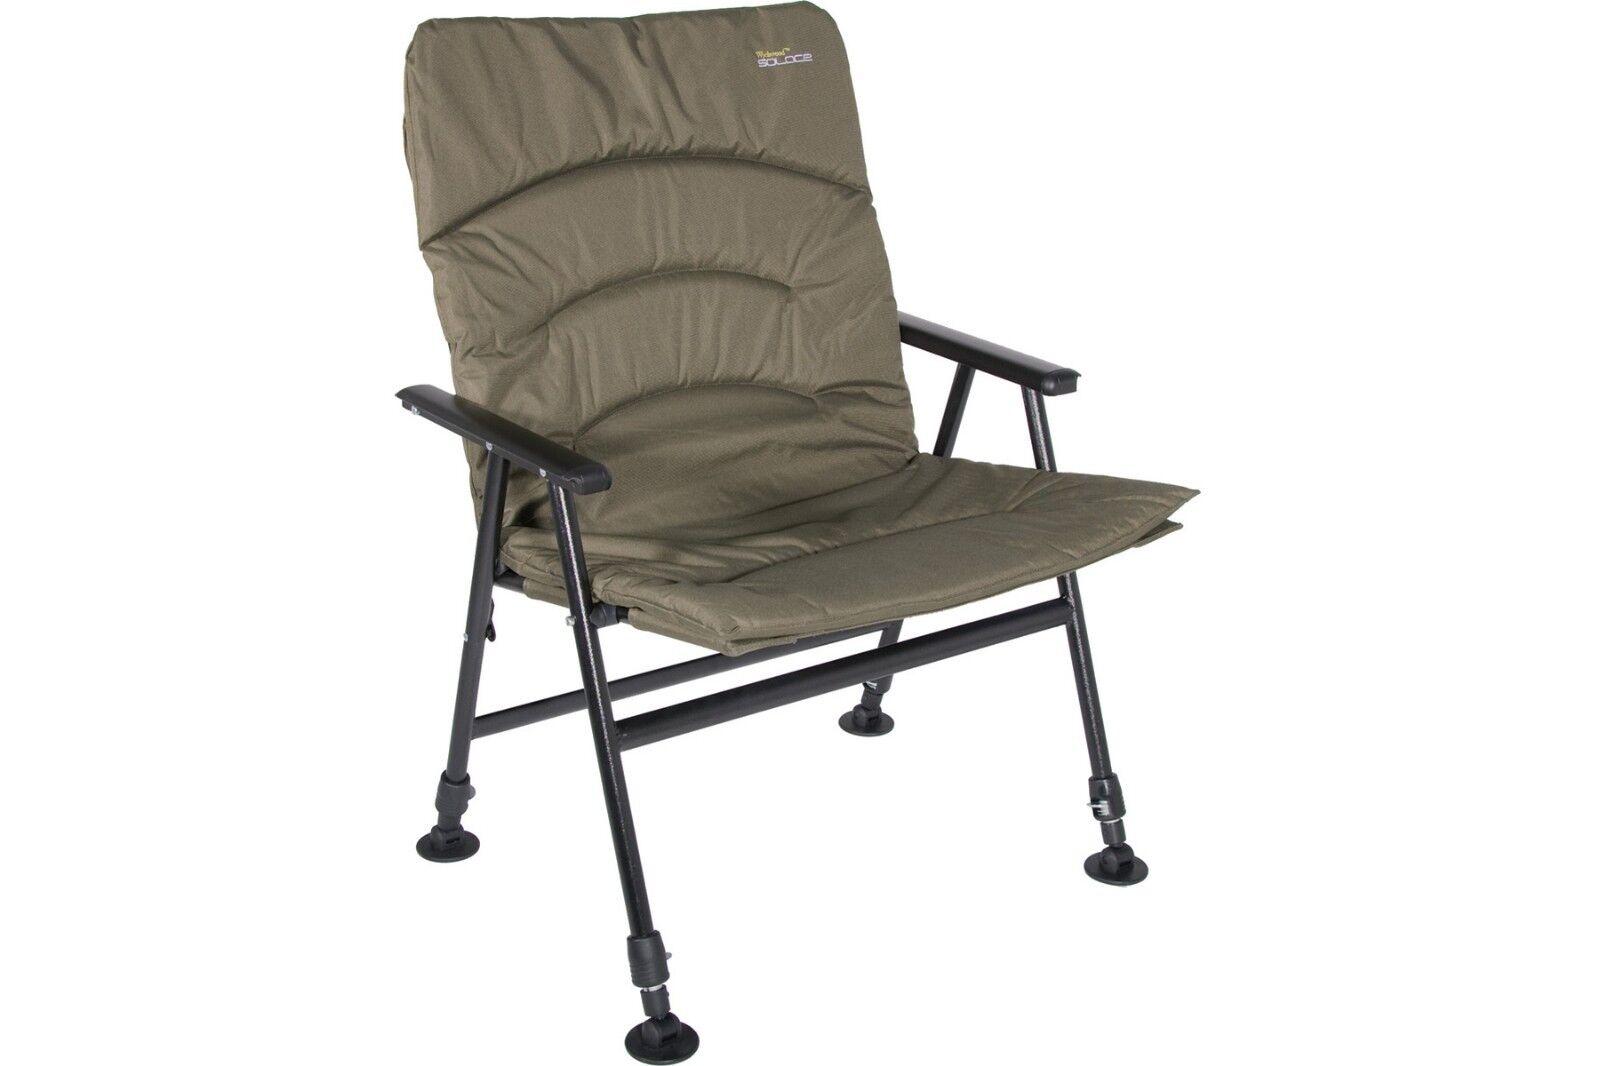 Wychwood Carp Comforter High Leg, Fishing Chair, Carp Chair, - Q0227